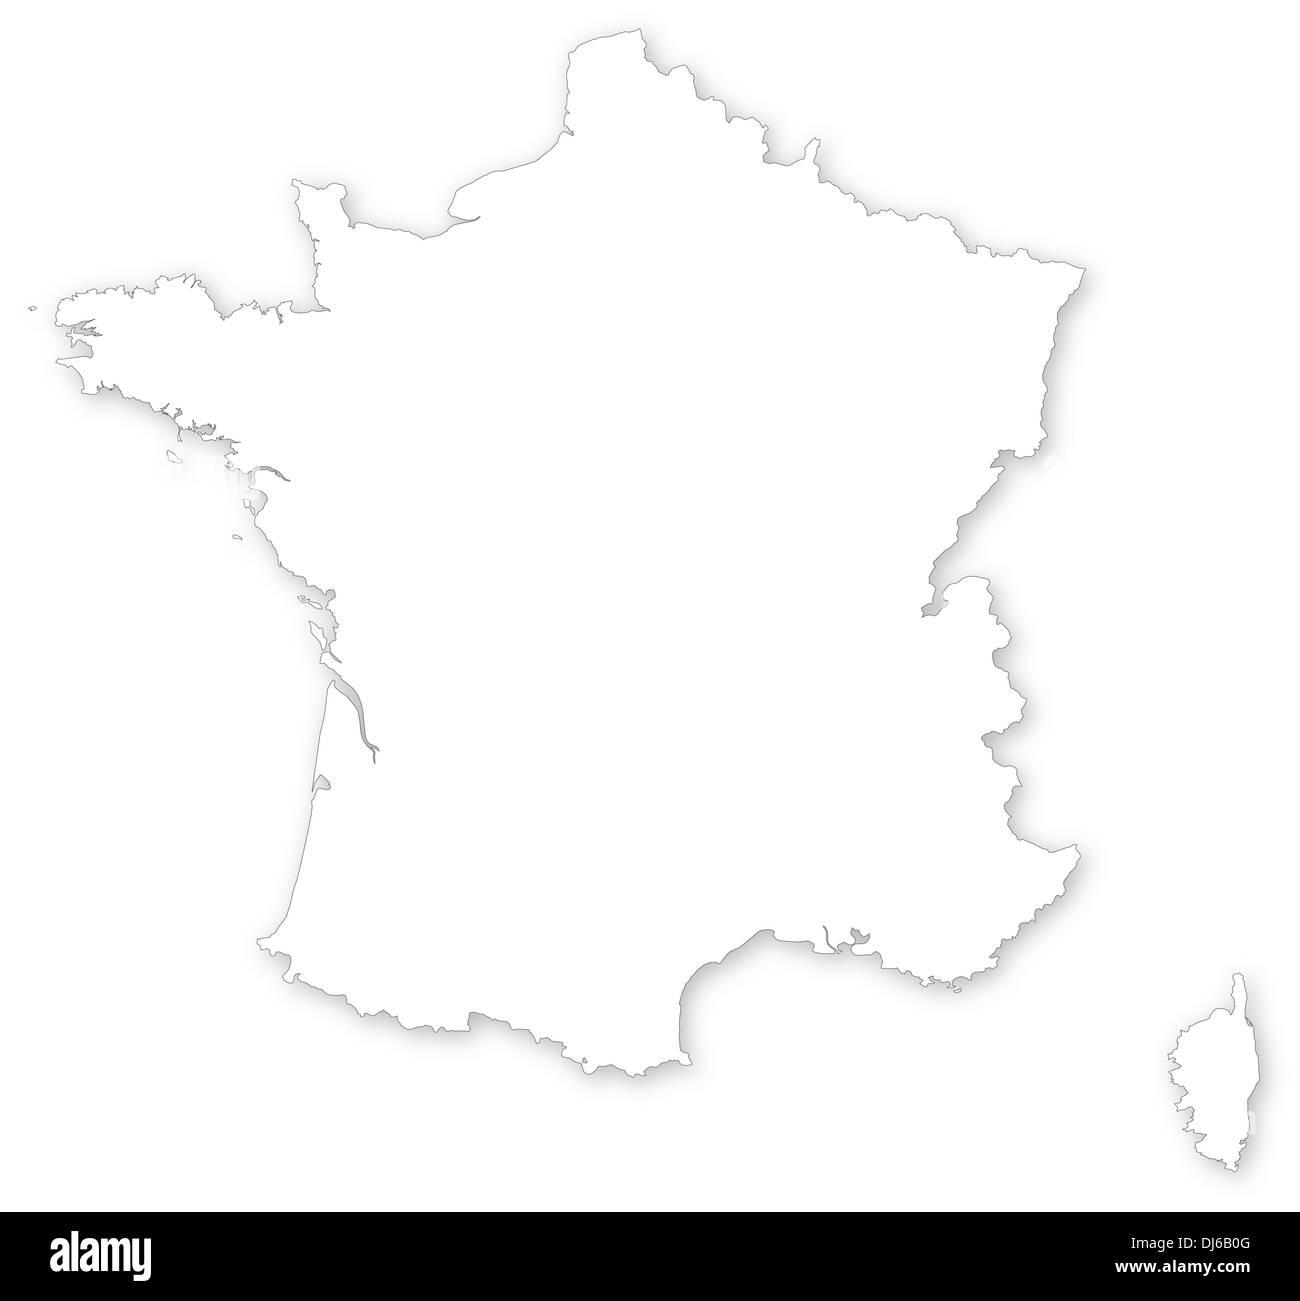 Corsica France Europe Map Stock Photos Corsica France Europe Map